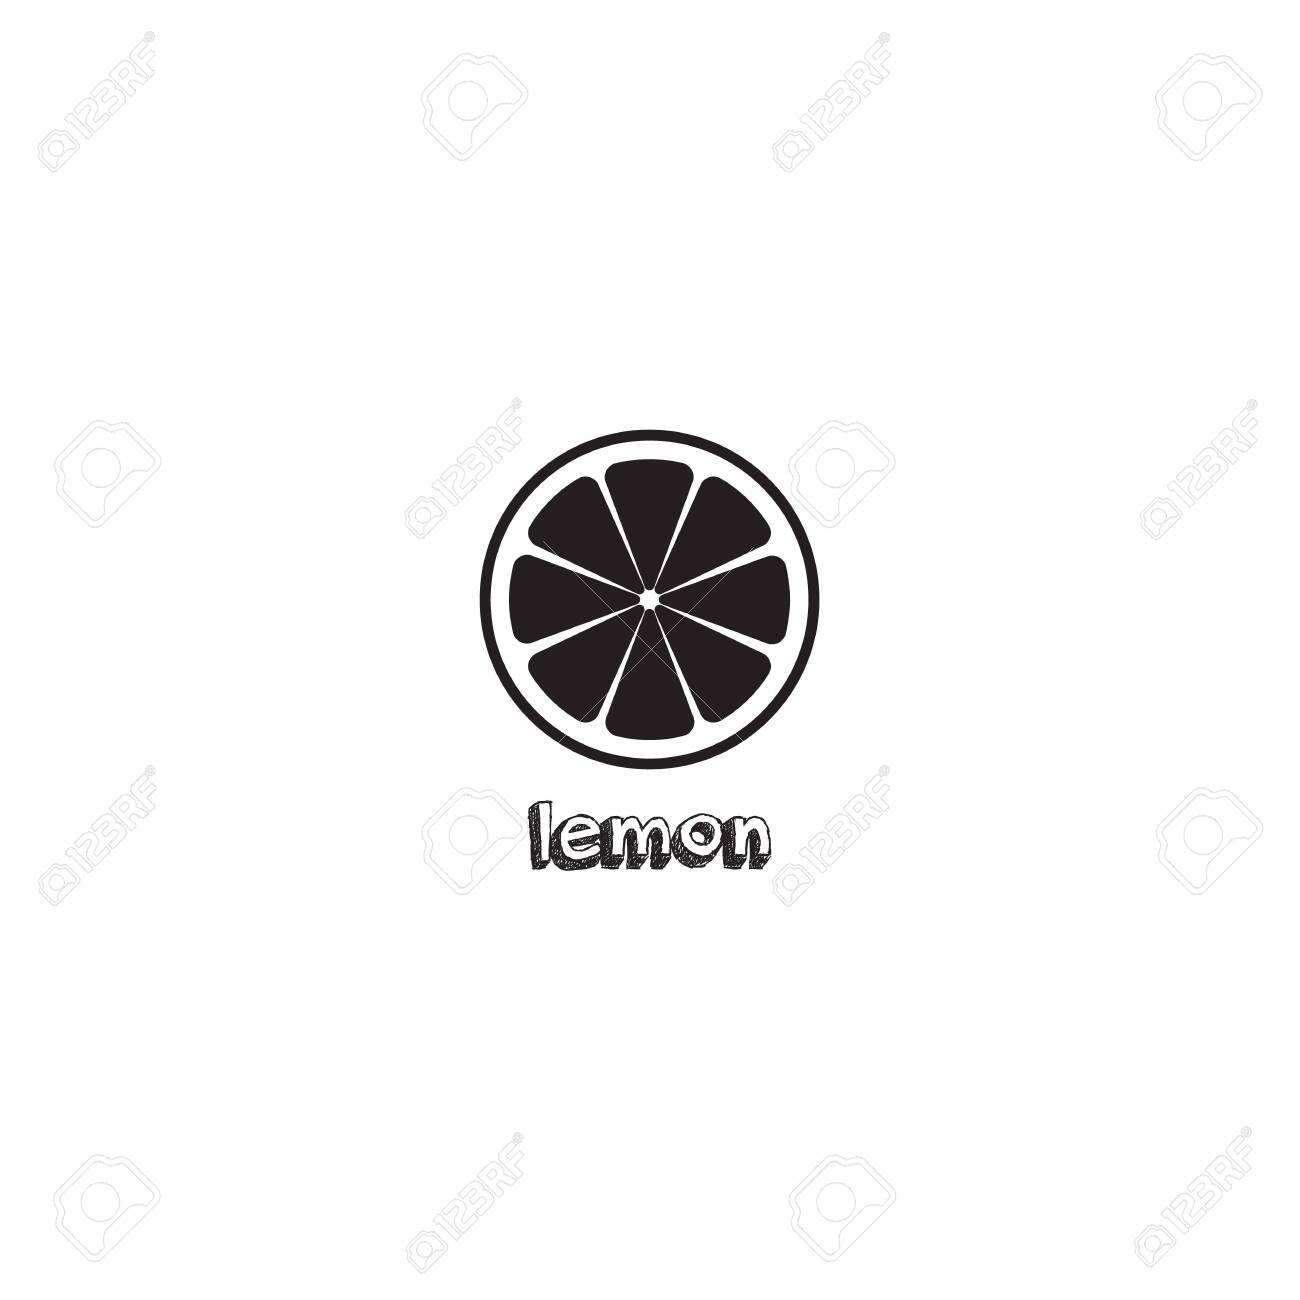 Lemon slice vector icon illustration on white background. Fresh sour vector lemon icon. Lemon sign, symbol, emblem. - 117186880